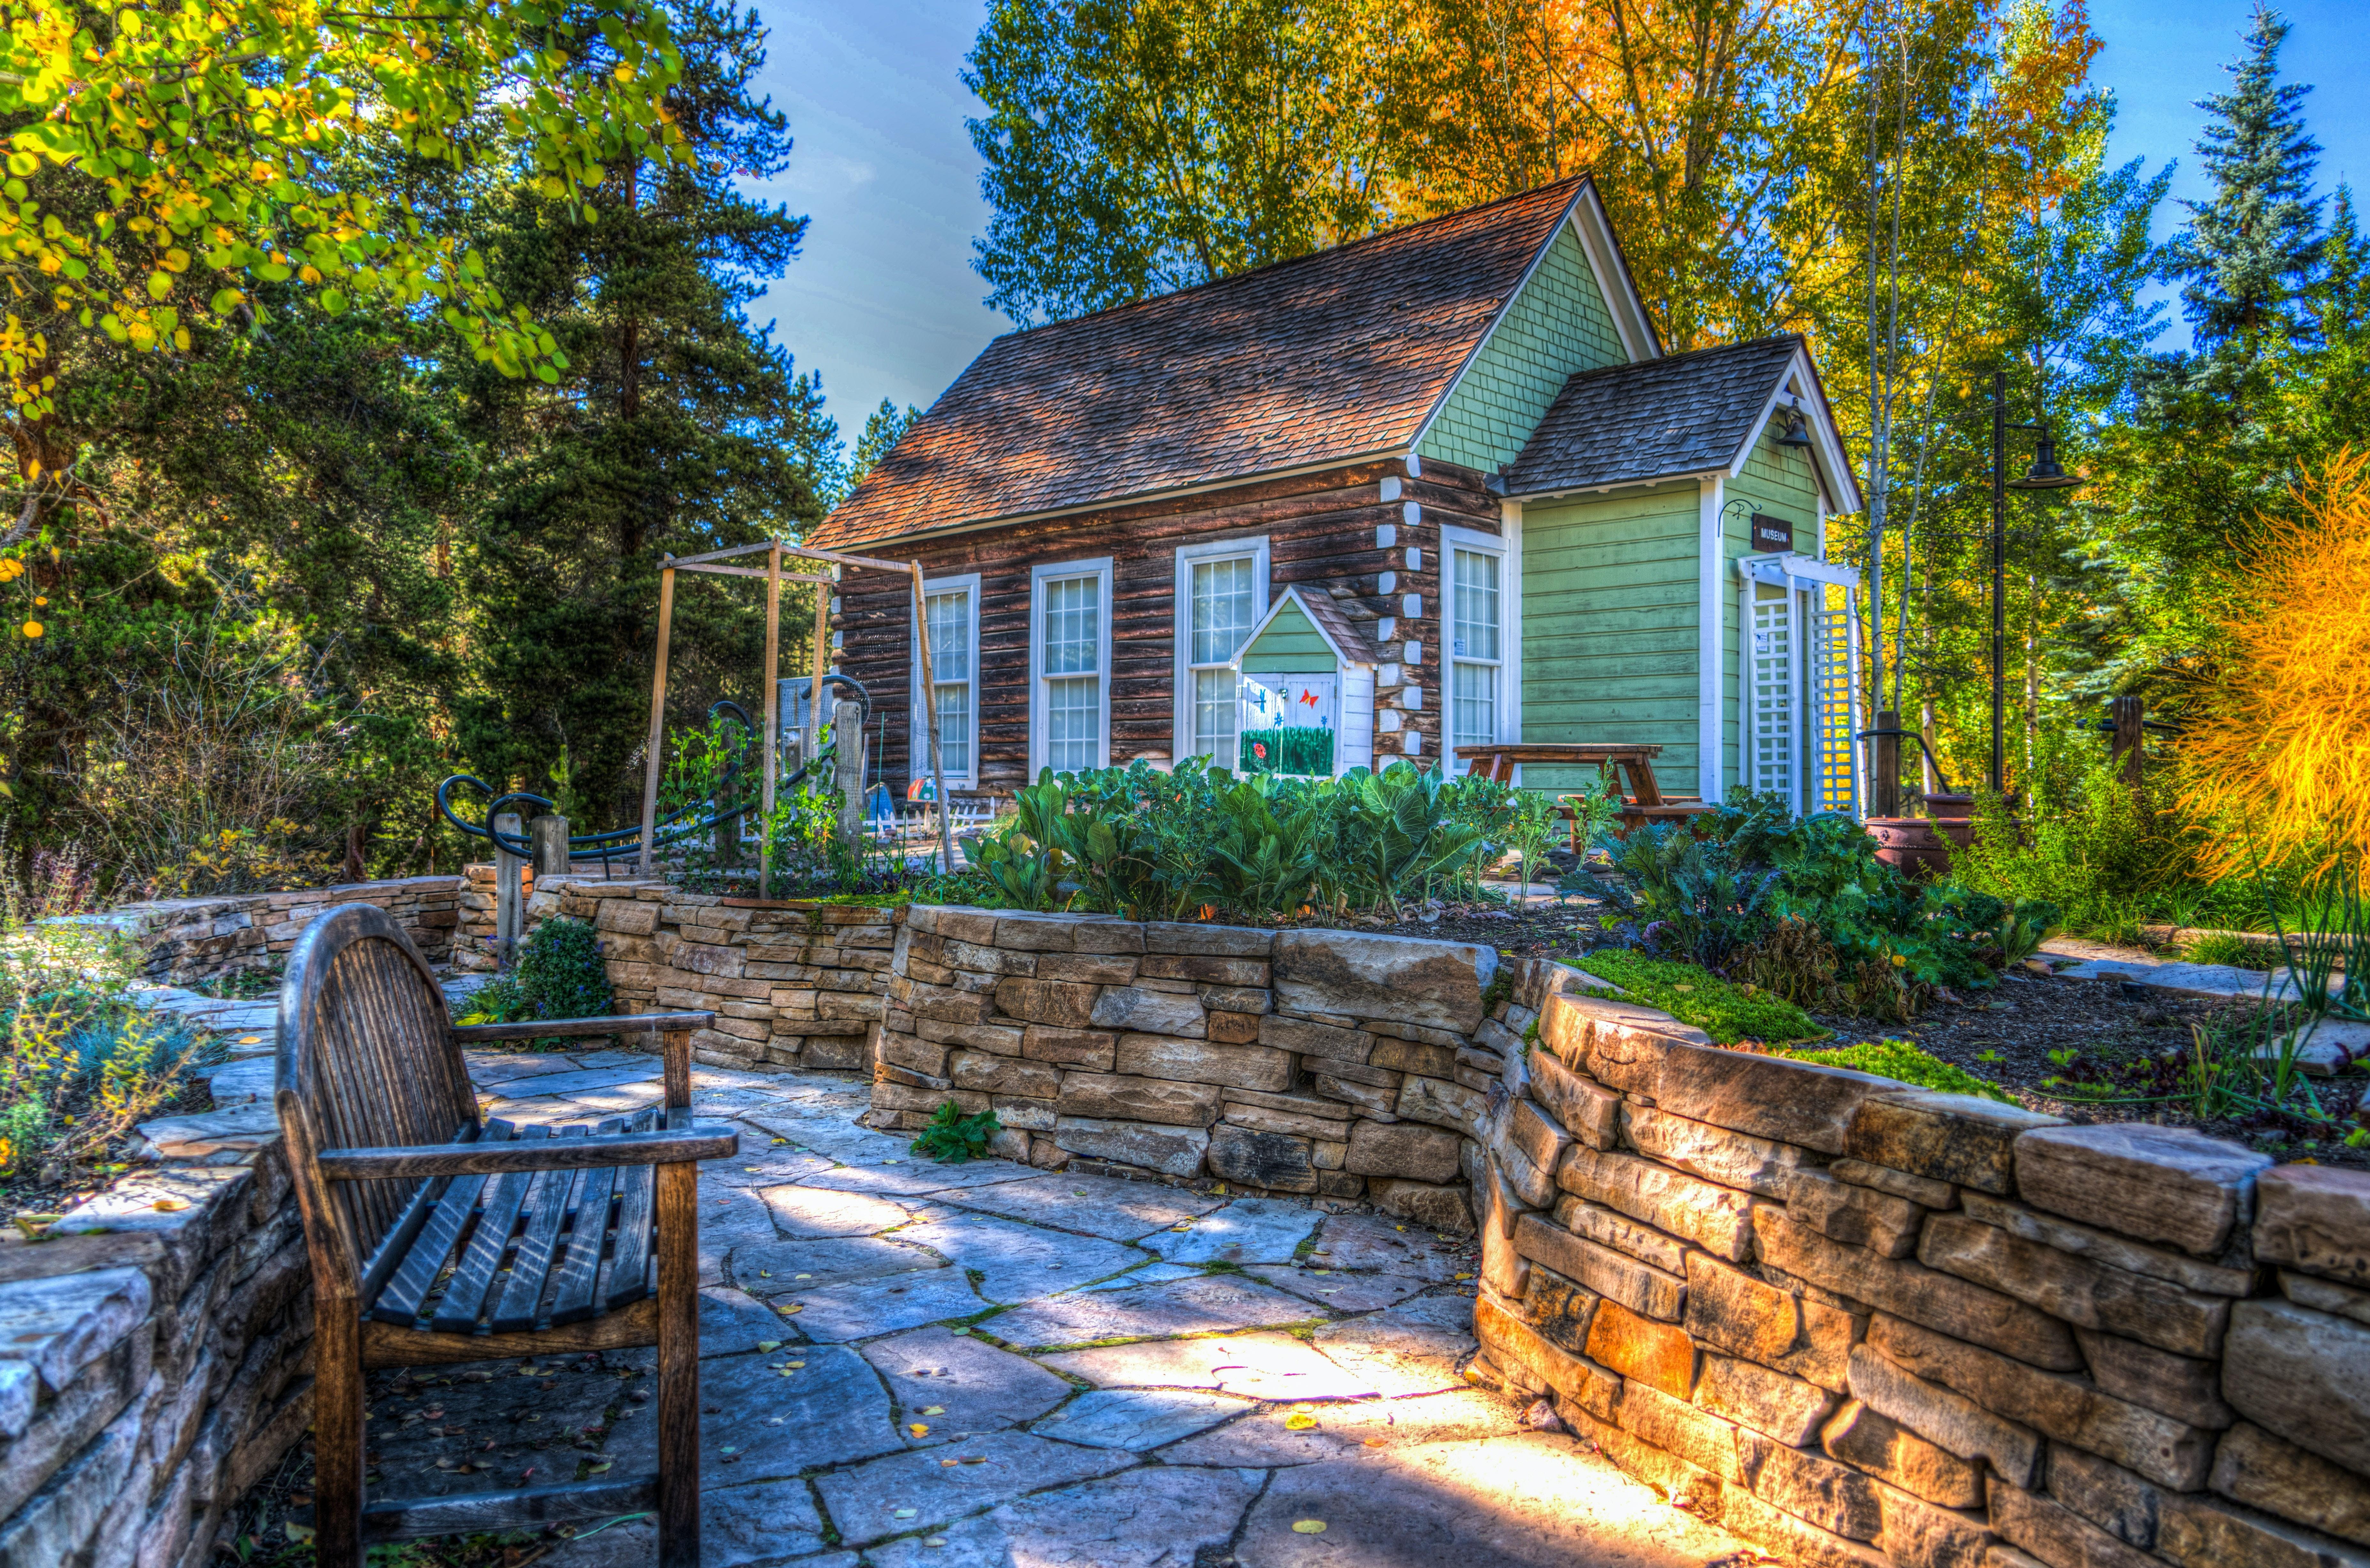 Landschaftsbilder pexels kostenlose stock fotos for The best house pictures